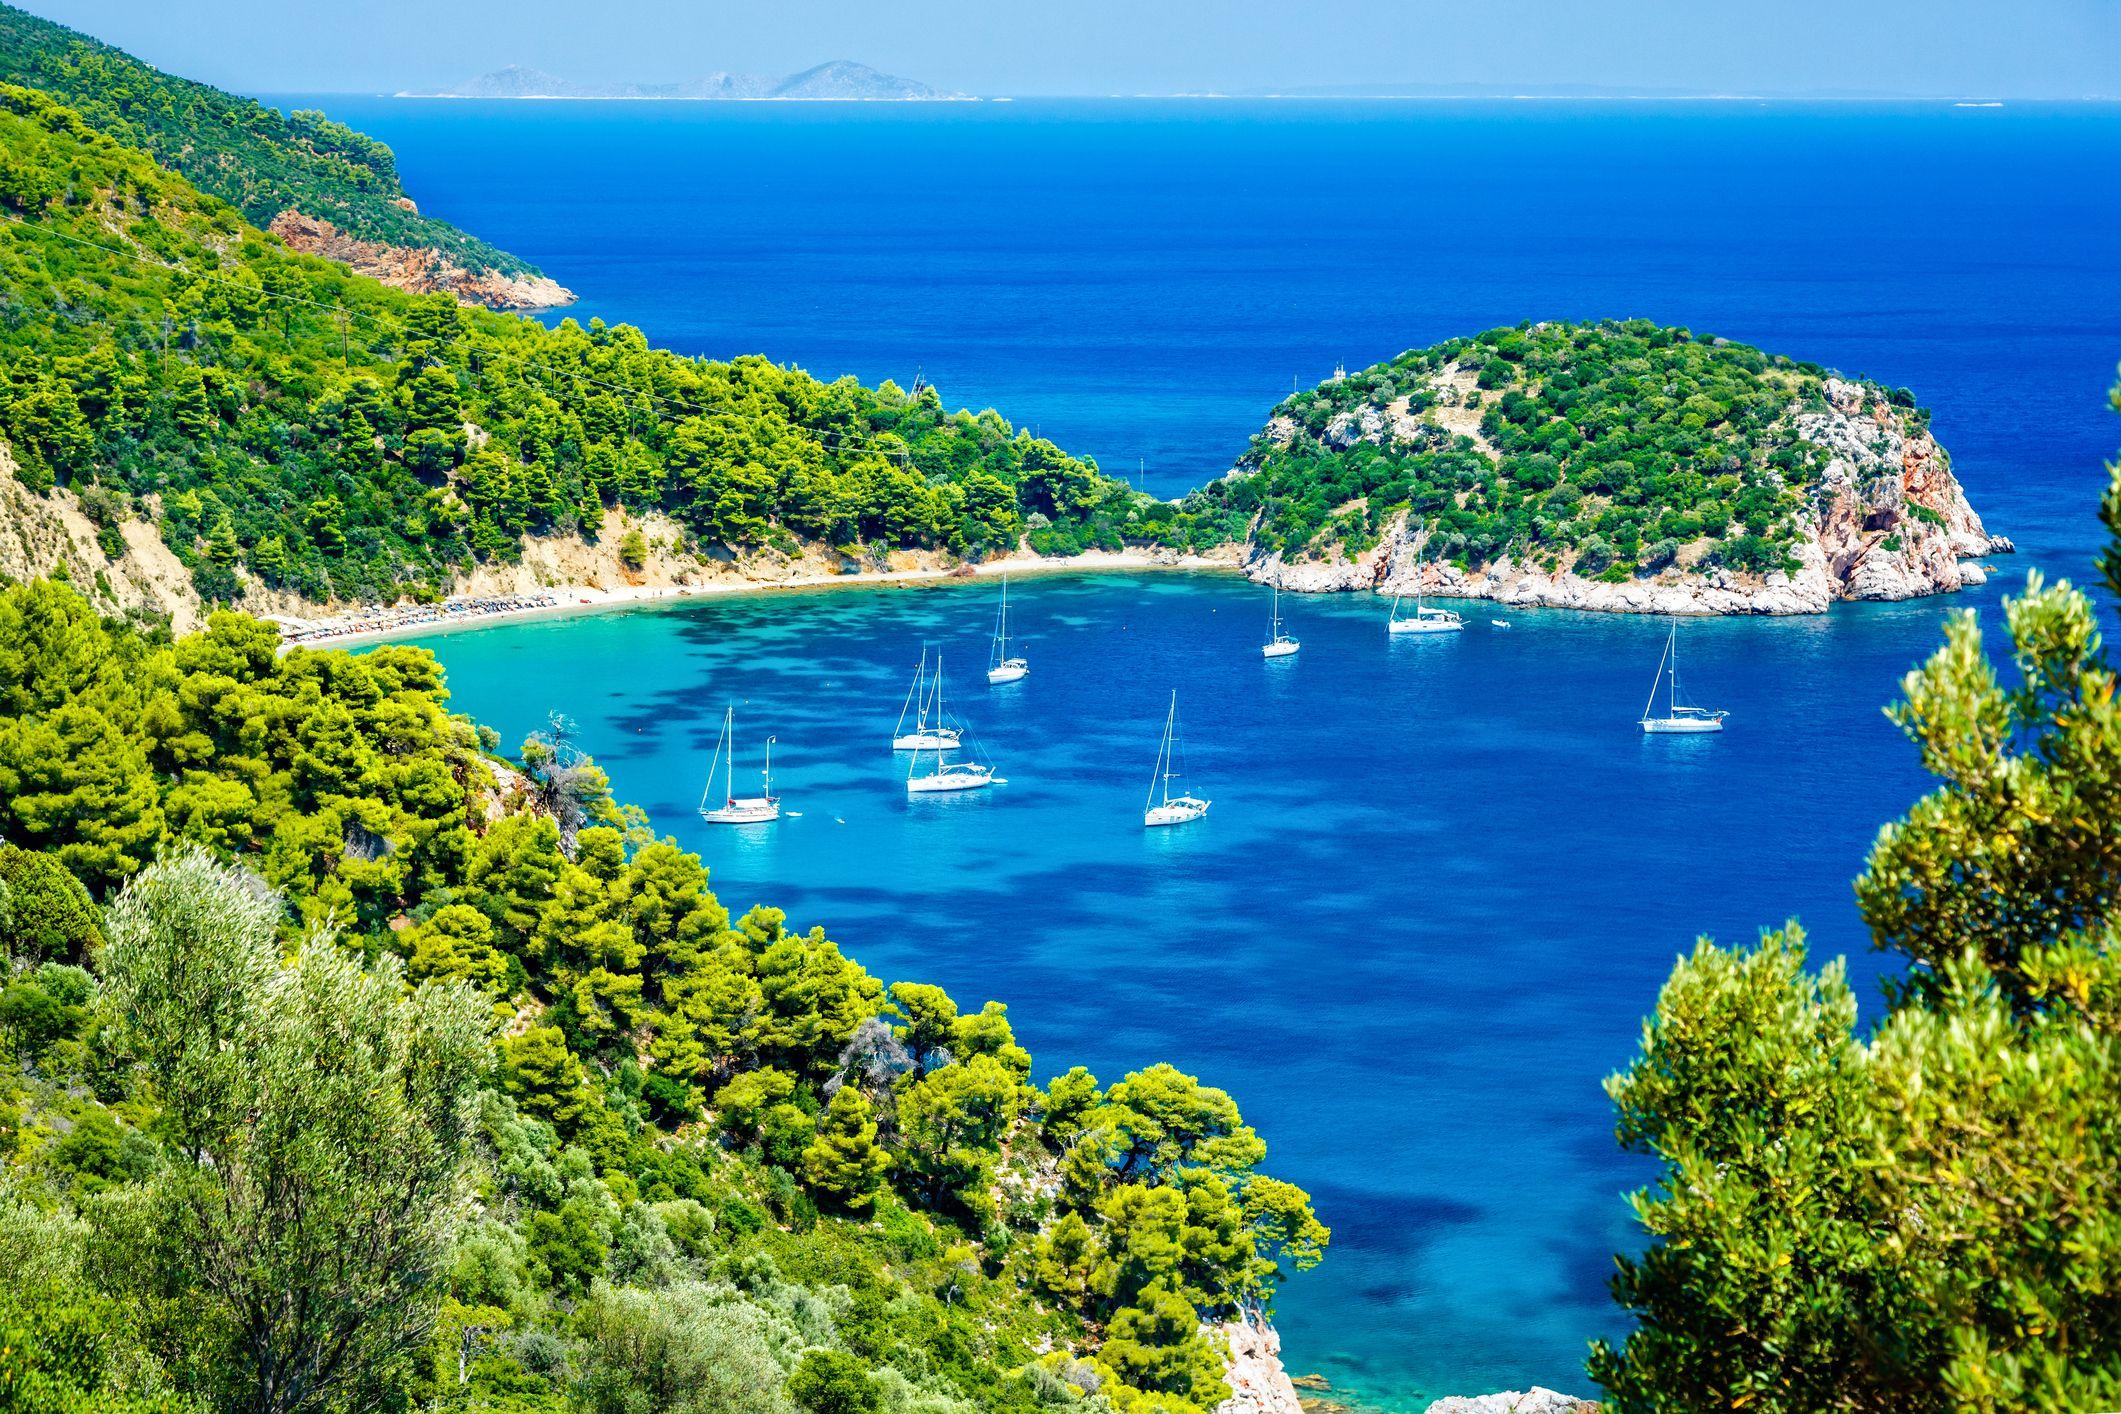 Your Getaway Guide to Skopelos Island, Where Mamma Mia Was Filmed